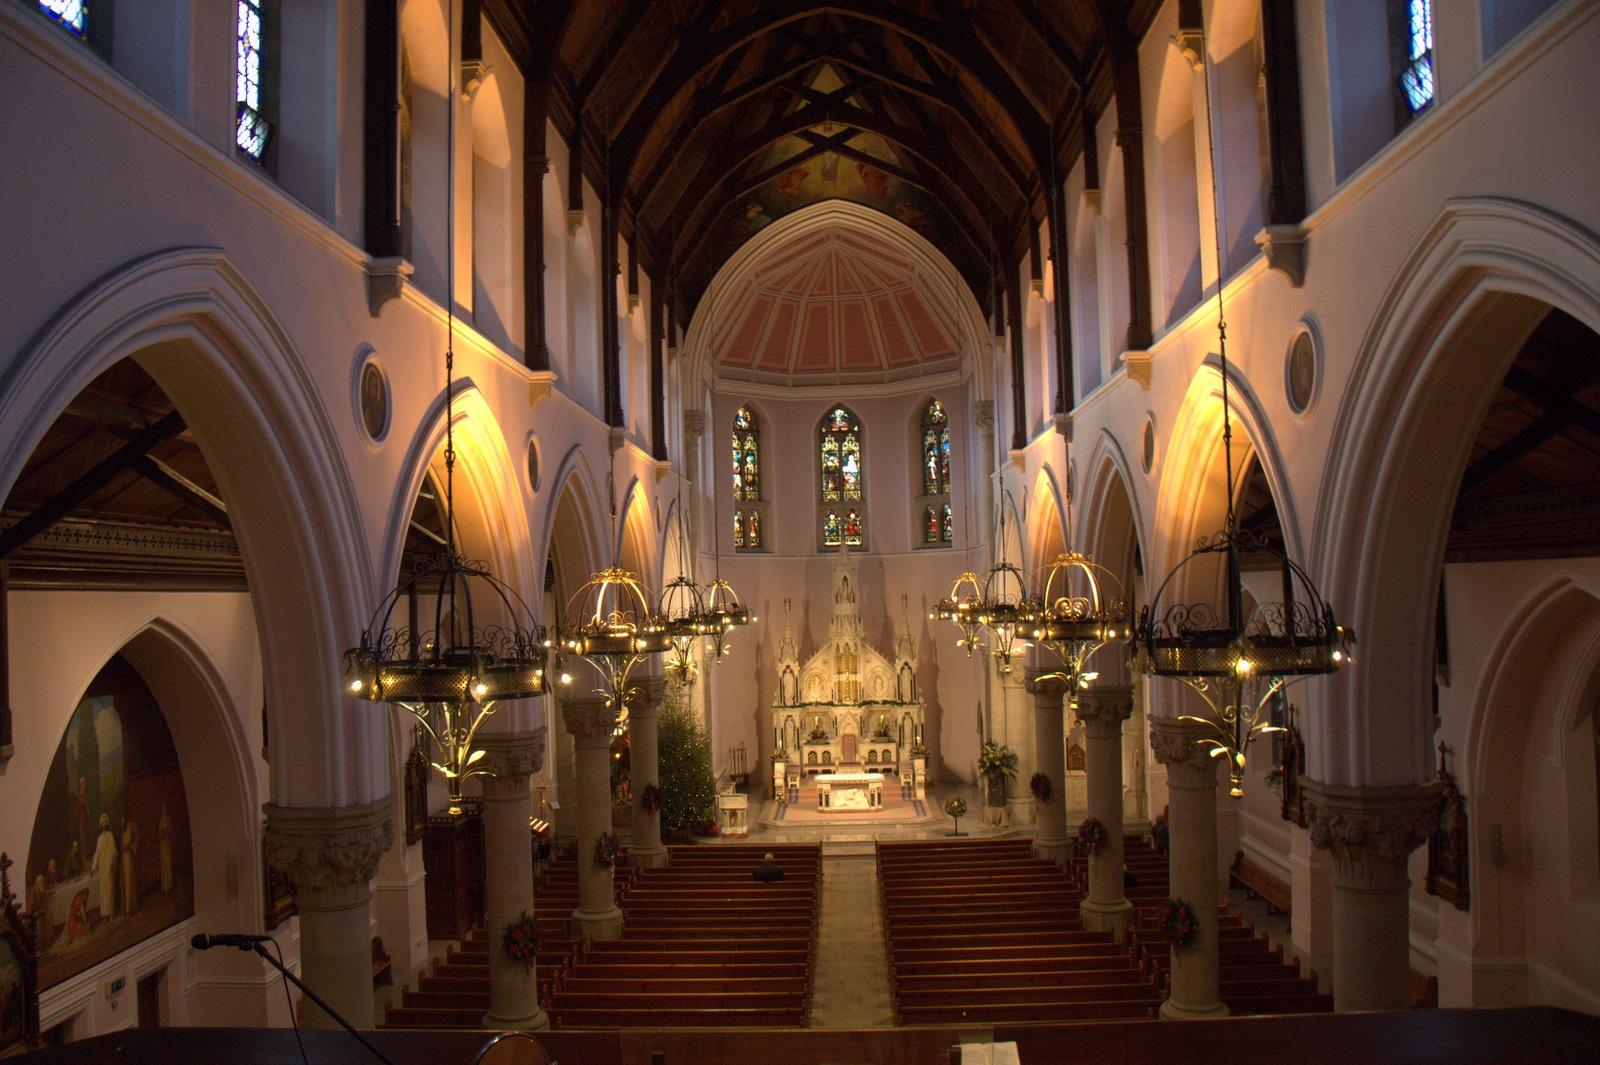 St Michael's Church, Enniskillen